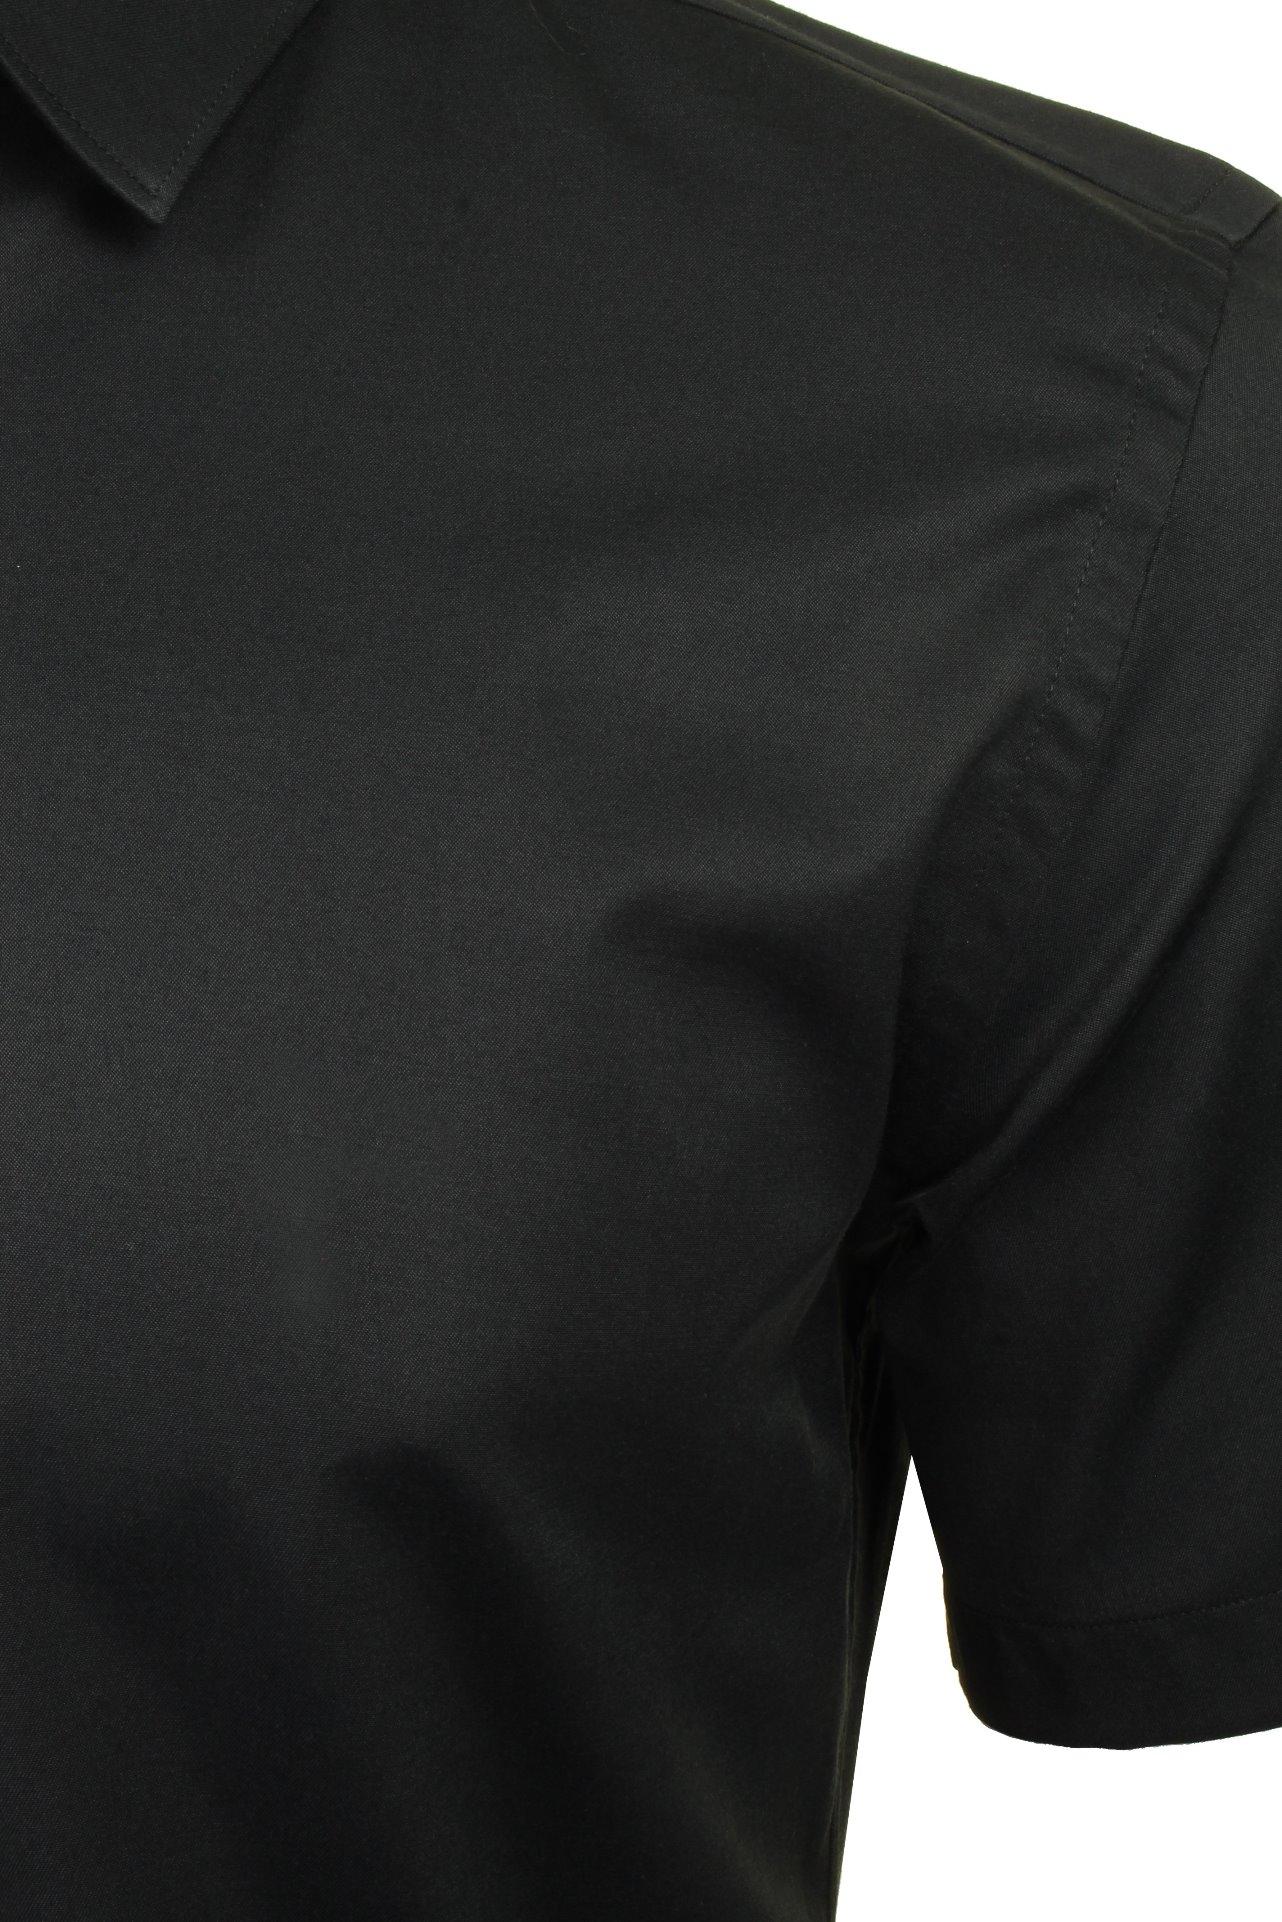 Xact-para-Hombre-de-Manga-Corta-Camisa-Slim-Fit-Popelin-del-estiramiento miniatura 5